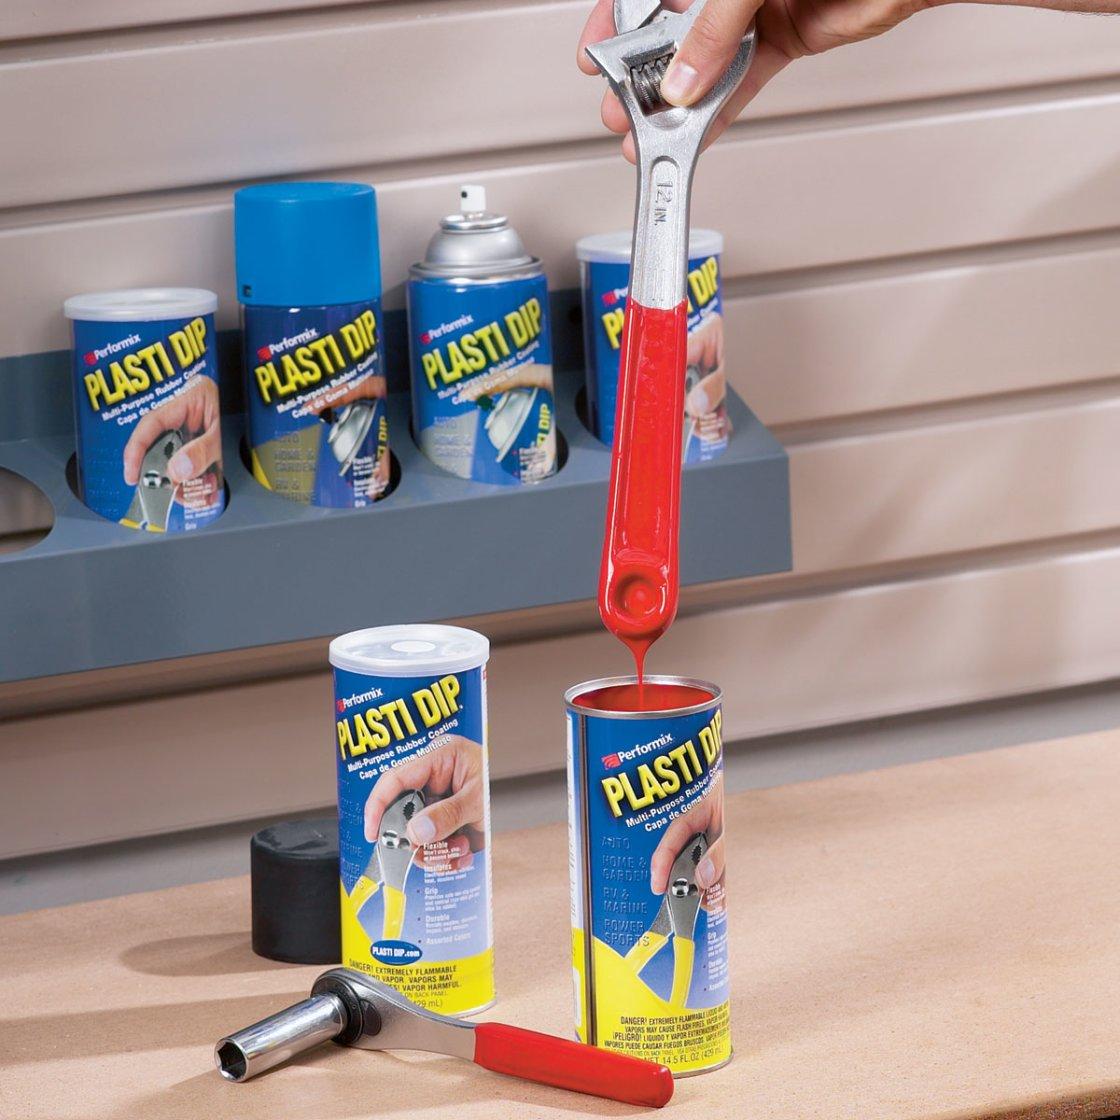 plasti dip dosen 429 ml blau cans 14 5 oz blue 15 99. Black Bedroom Furniture Sets. Home Design Ideas